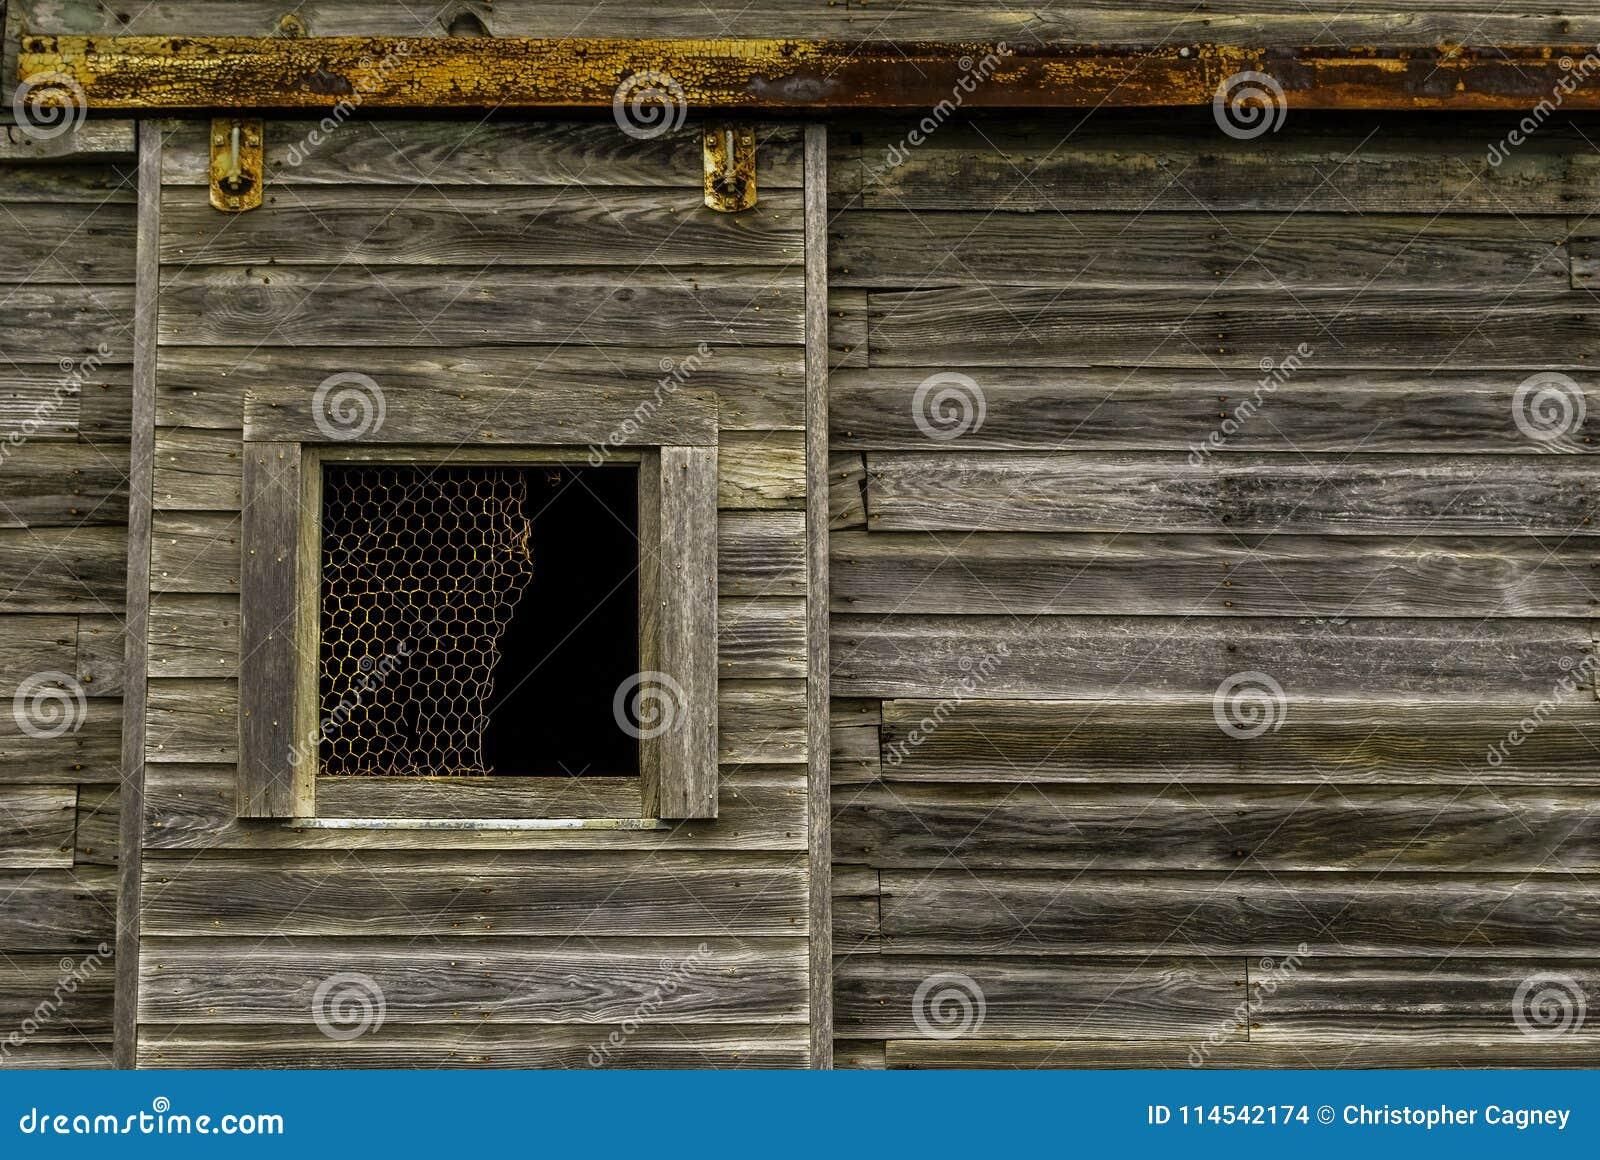 The Old Barn Door Stock Photo Image Of Grey Exterior 114542174